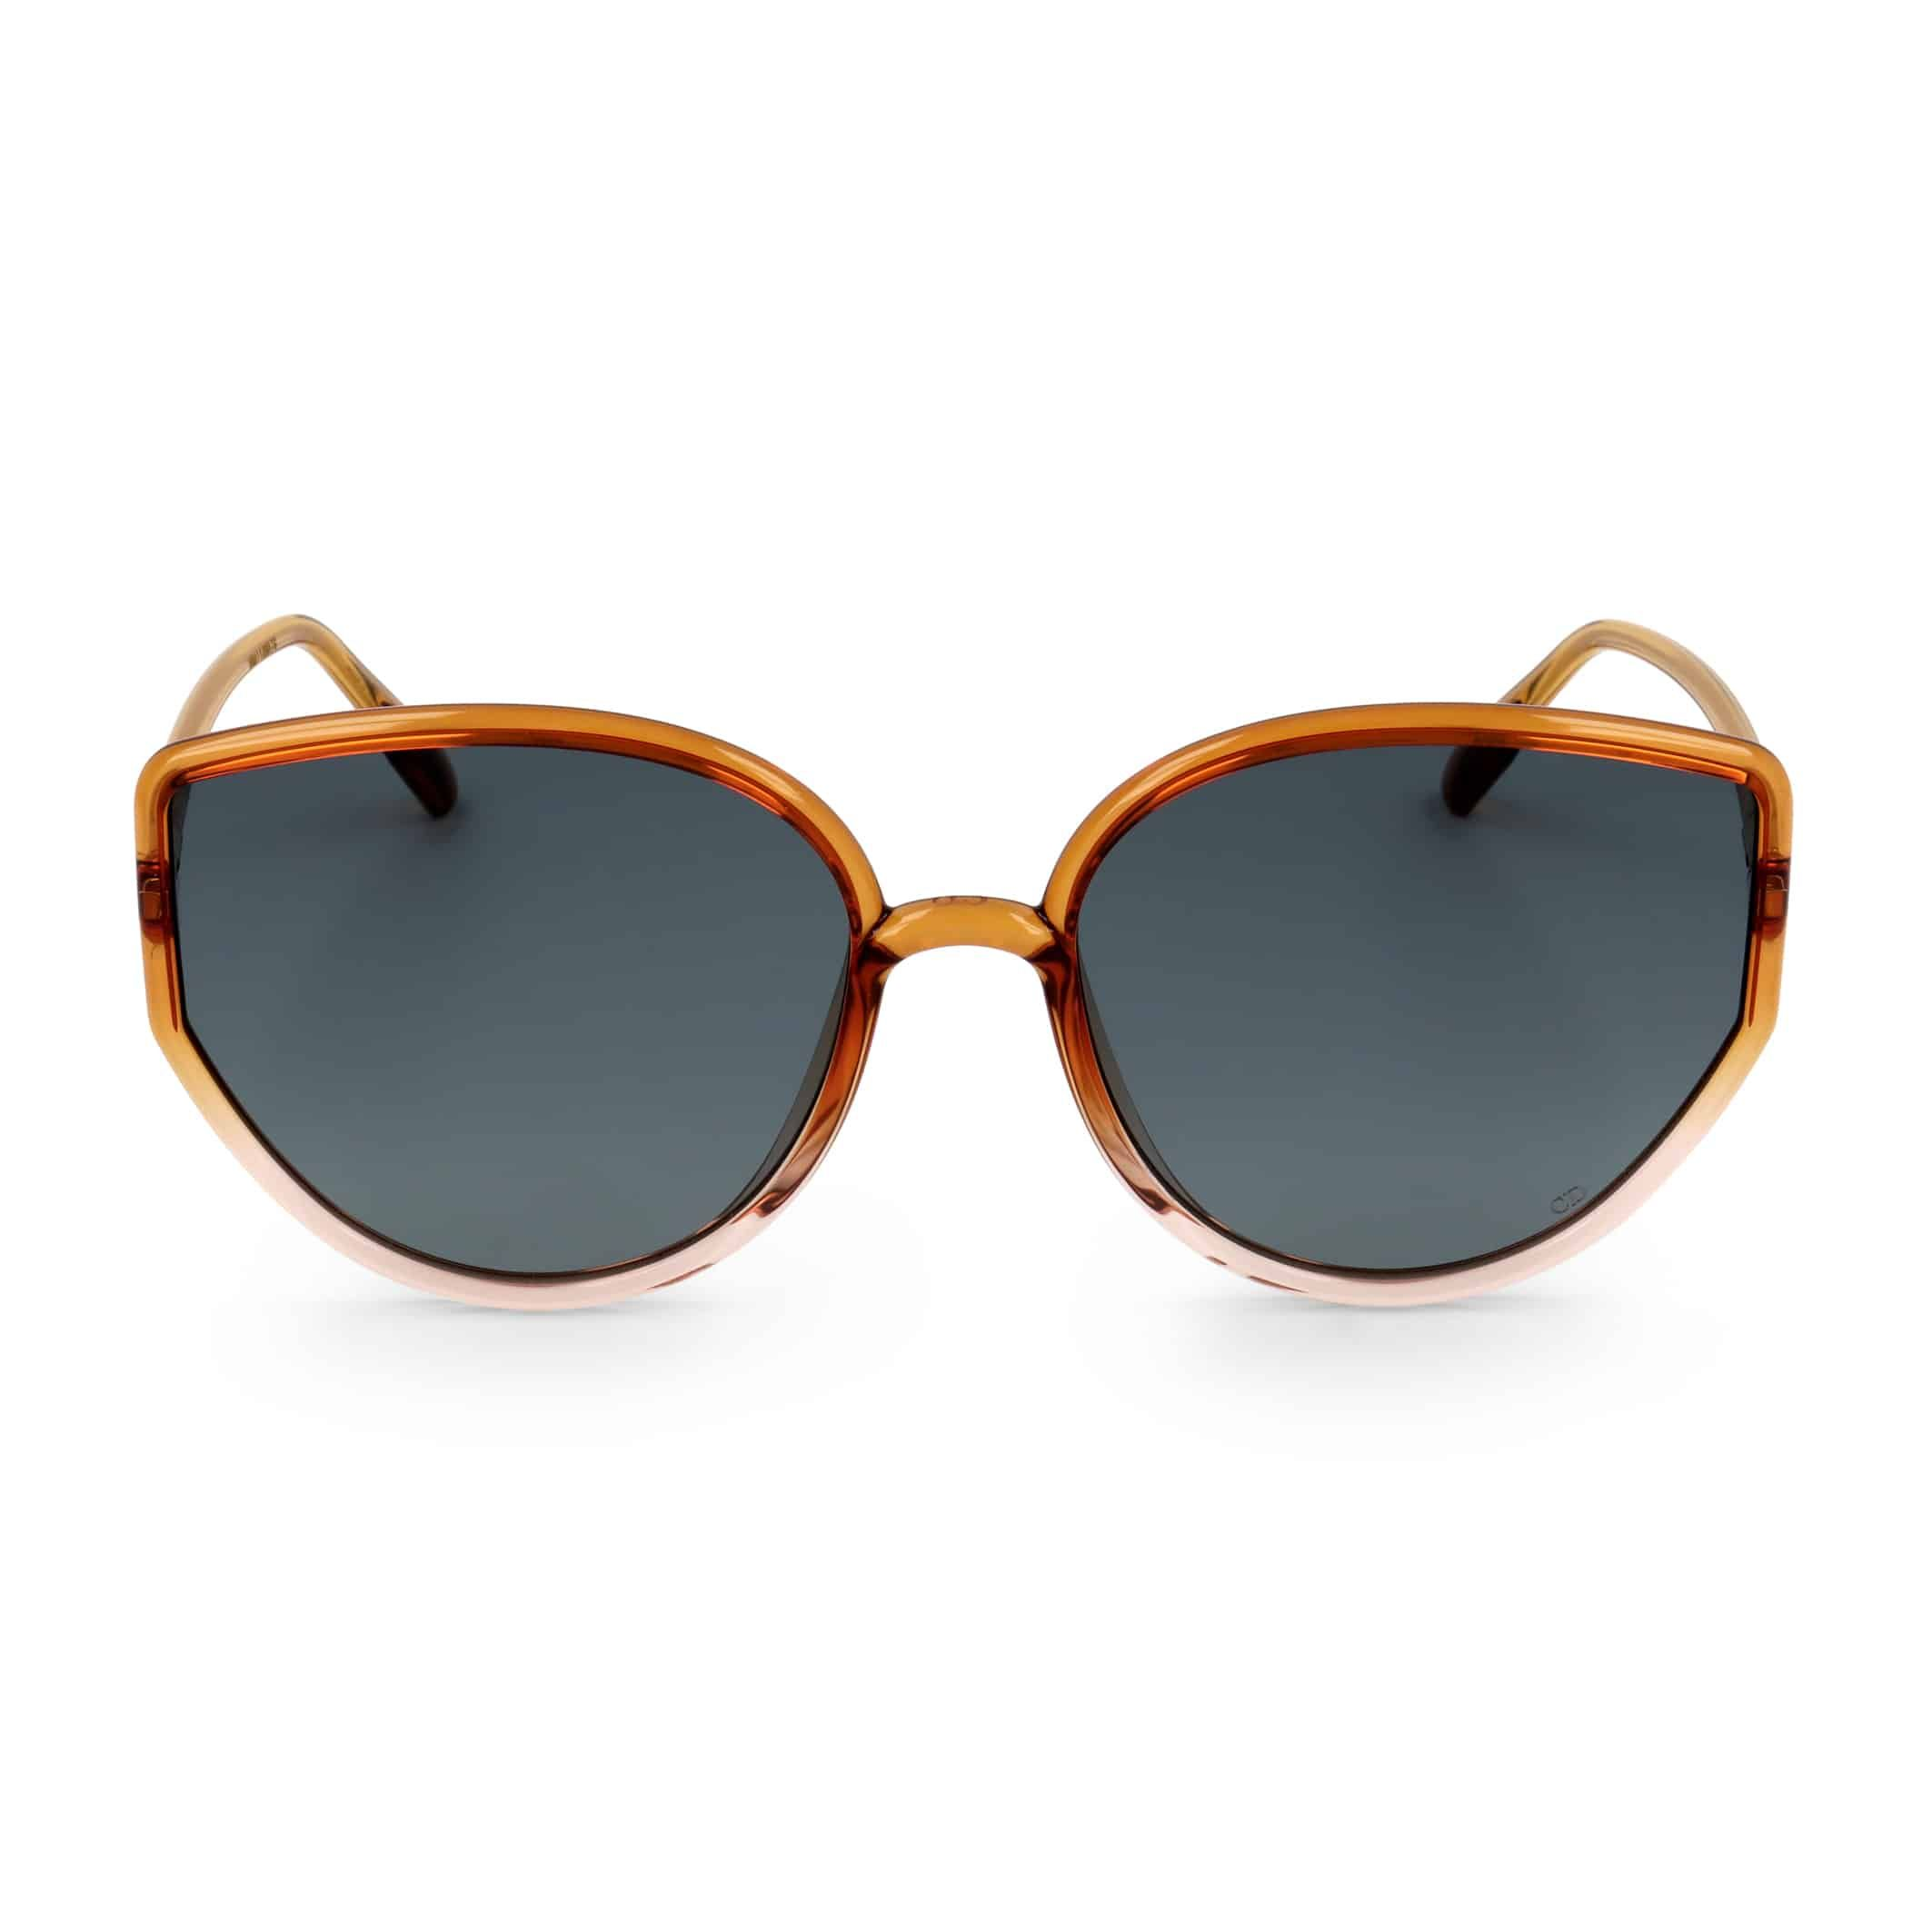 Dior – SOSTELLAIRE4 – Naranja